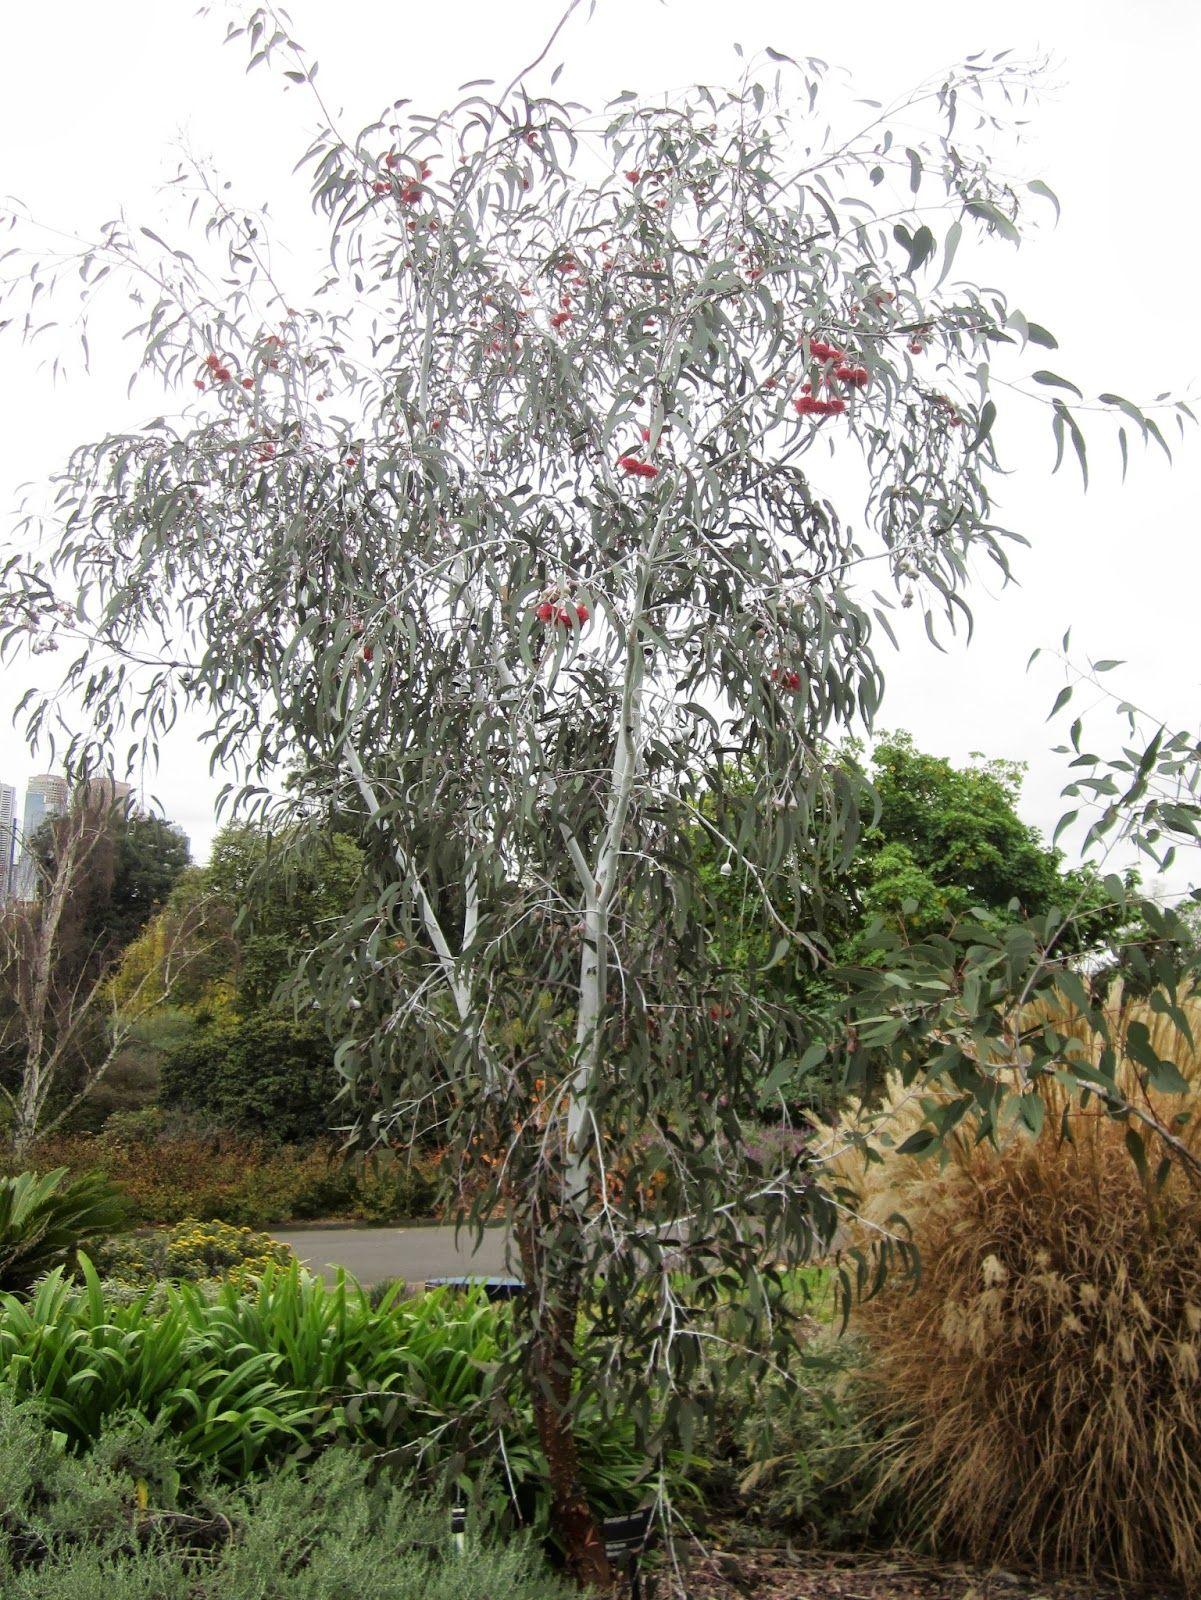 565a8150ef0a1946fb908716d5e59600 - Australian Native Trees For Small Gardens